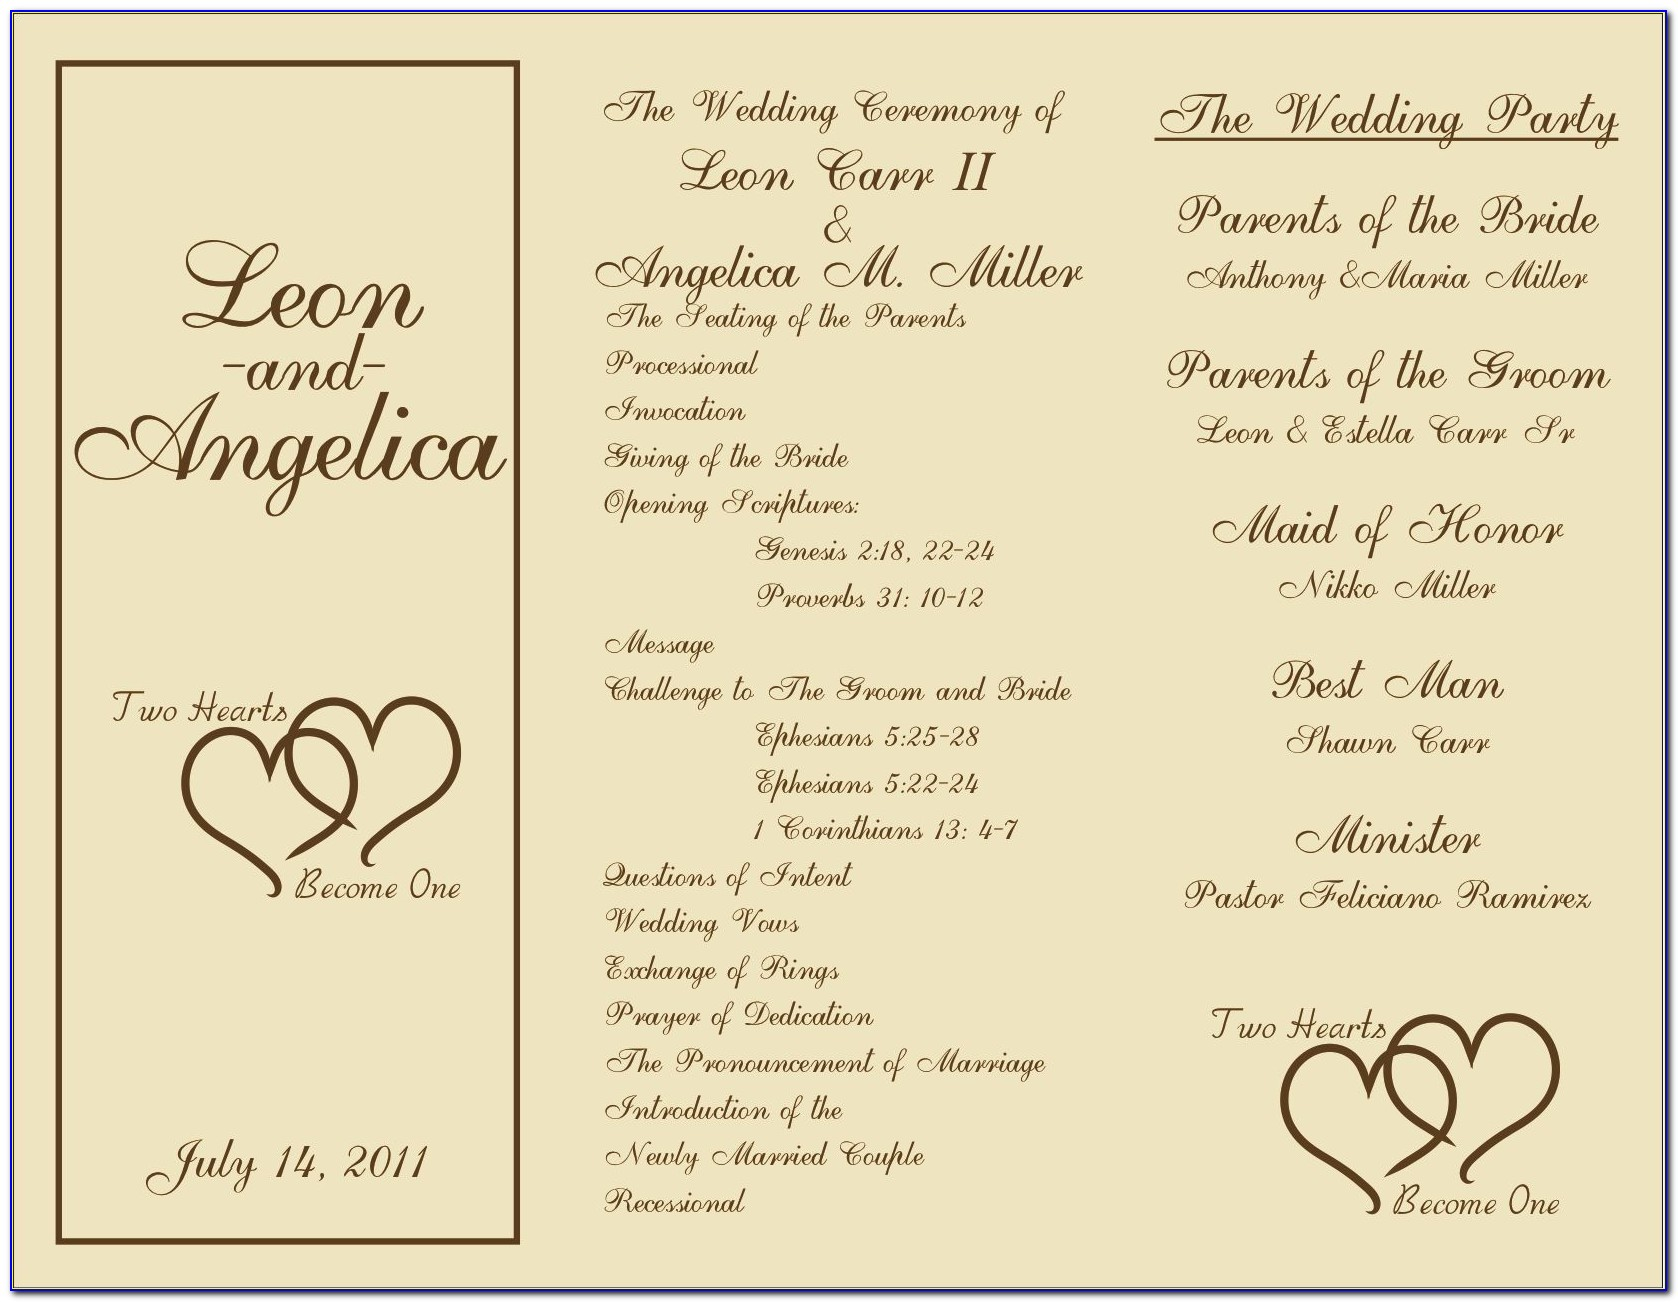 Wedding Program Layout Examples